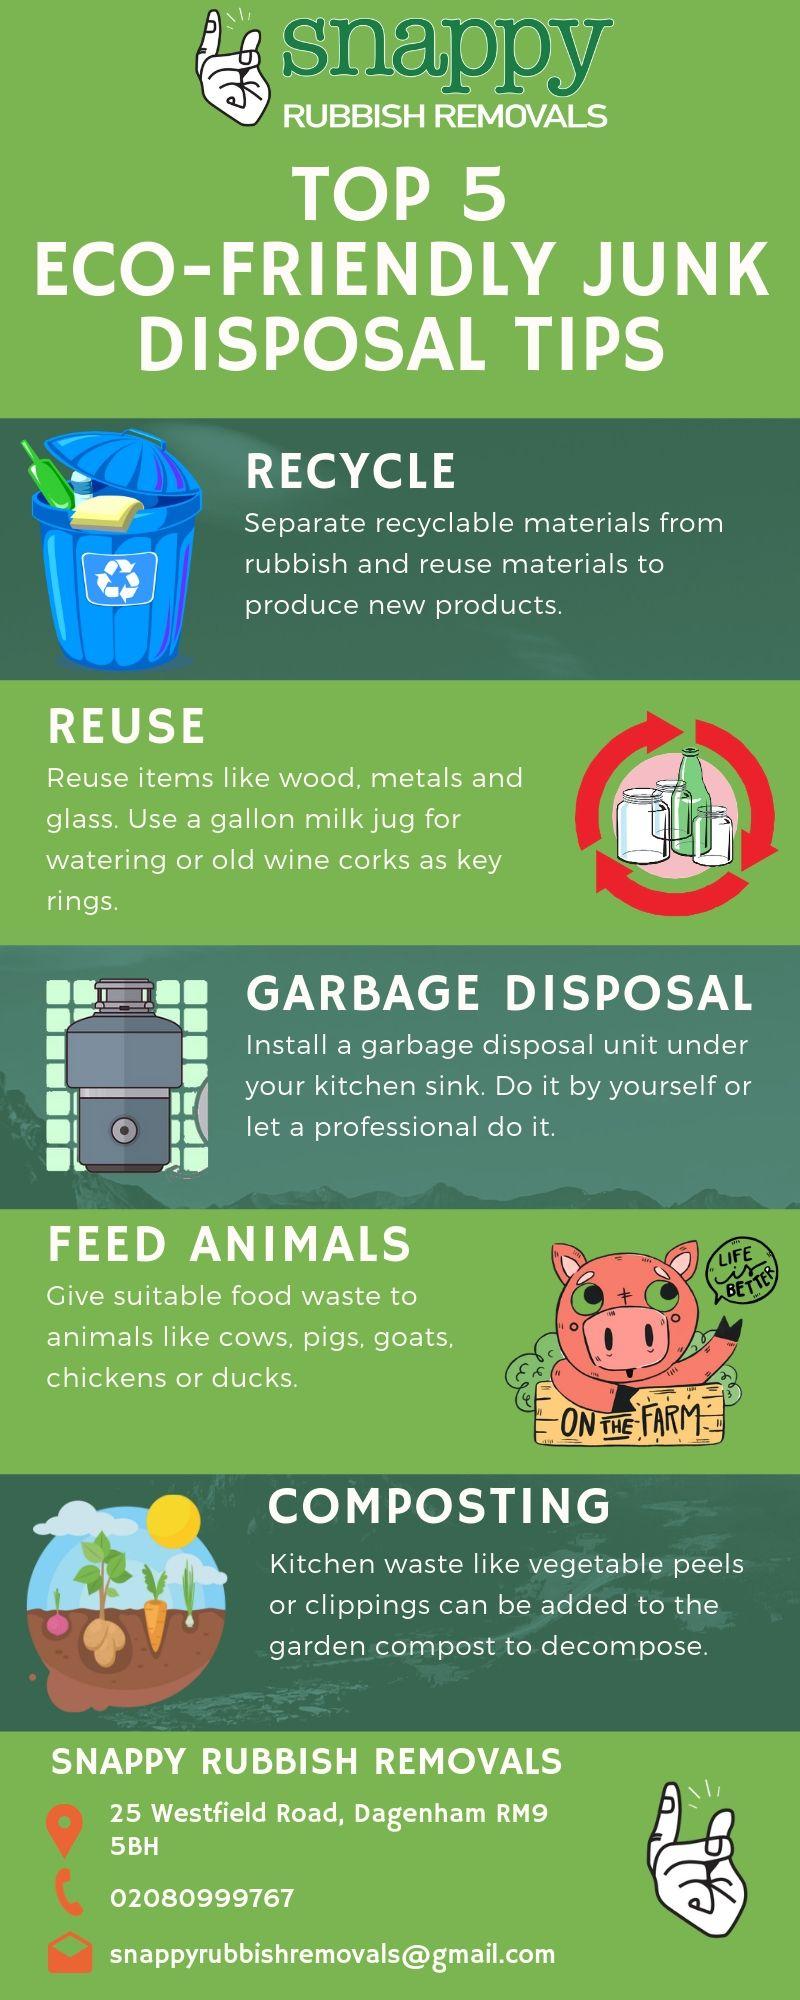 Eco-Friendly Junk Disposal Tips